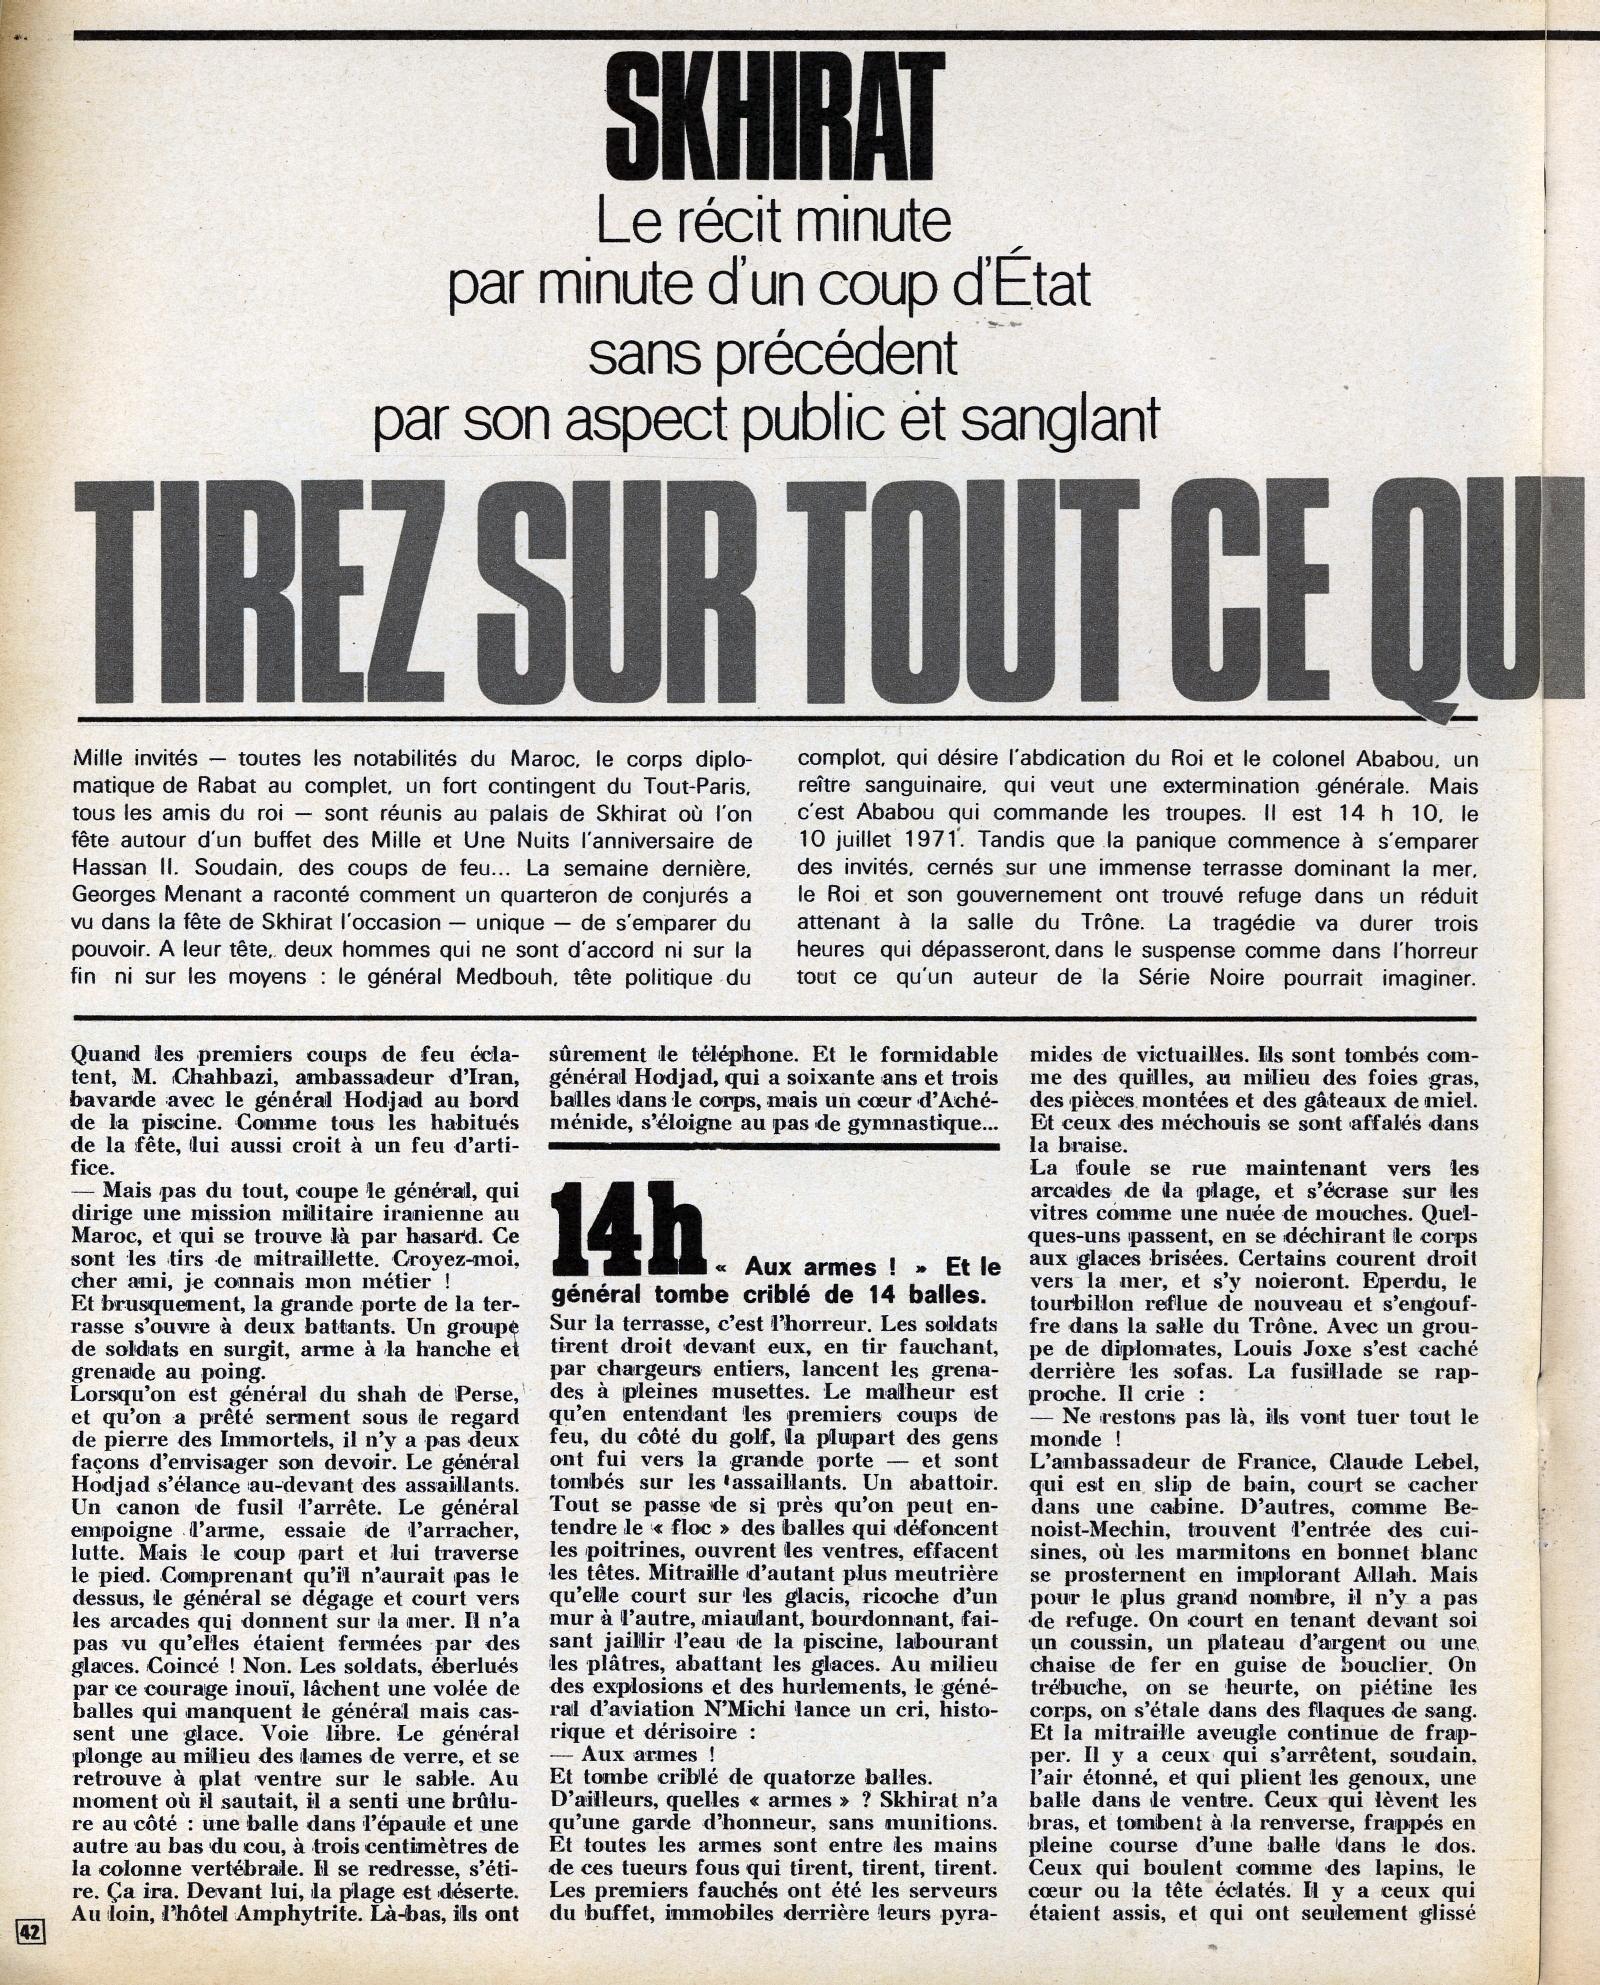 Tentative de coup d'État à Rabat et Skhirate le 10 juillet 1971  48695668616_015c8caf47_o